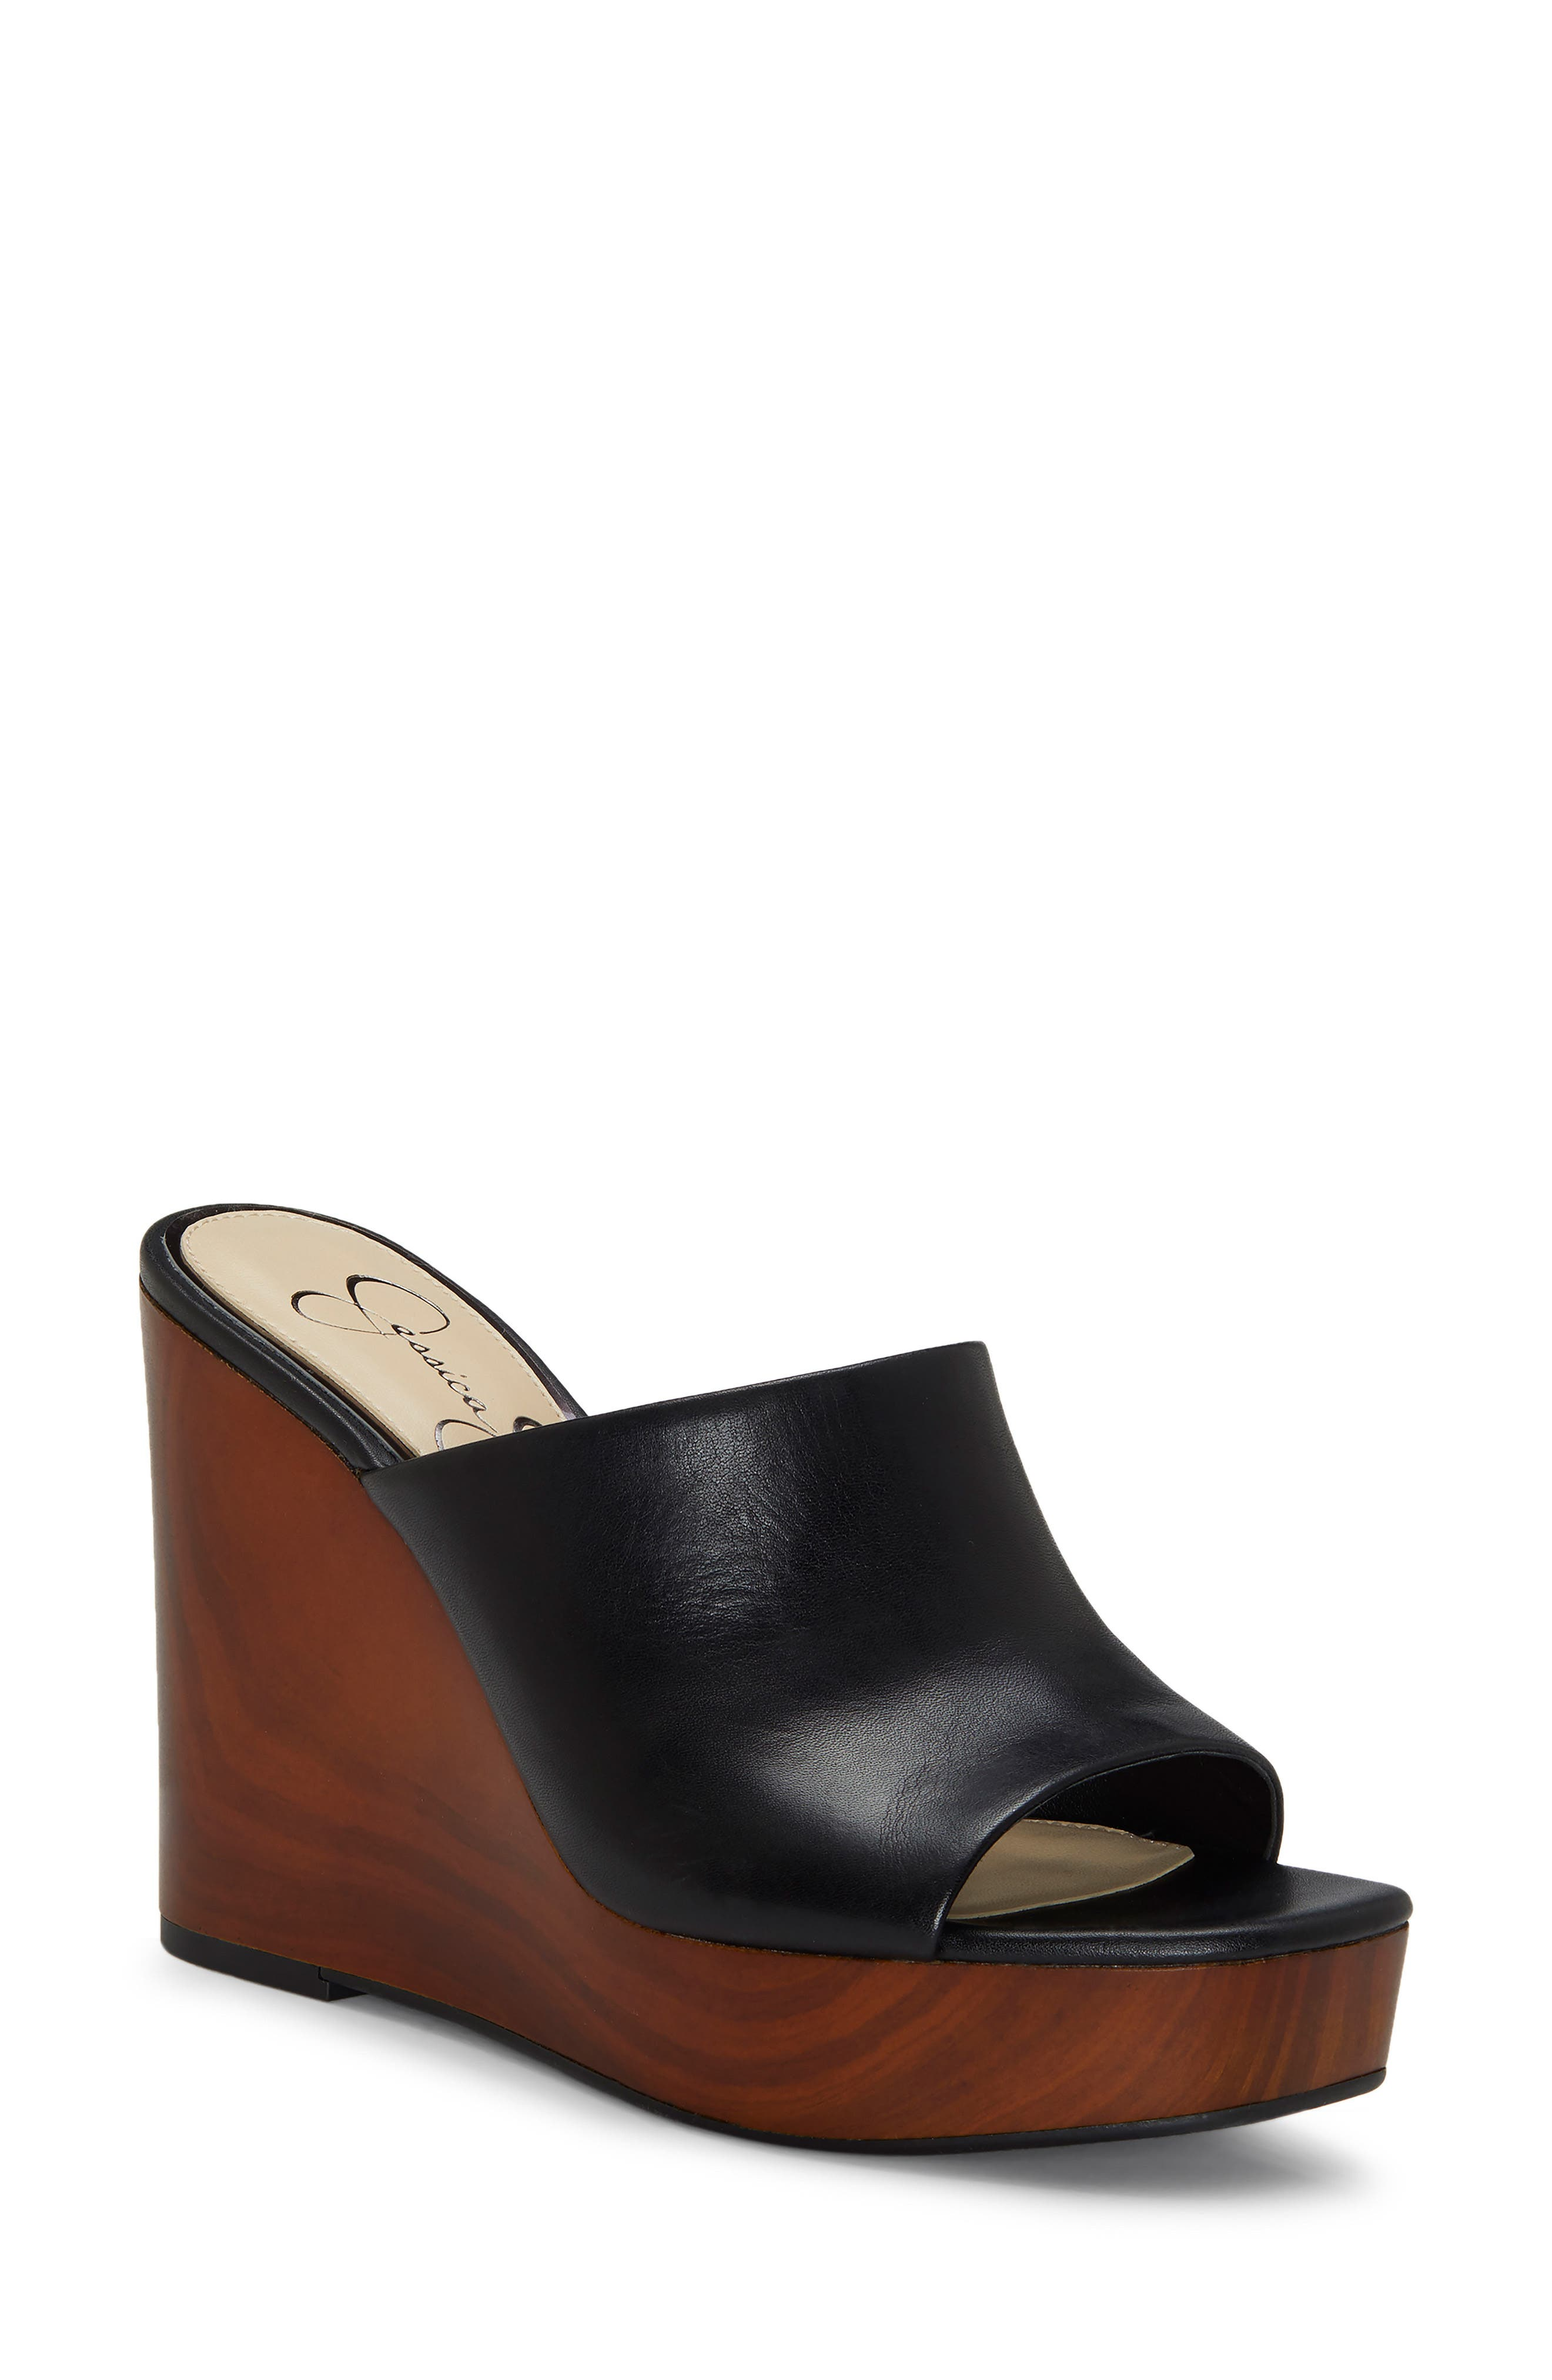 Jessica Simpson Shantelle Wedge Slide Sandal- Black